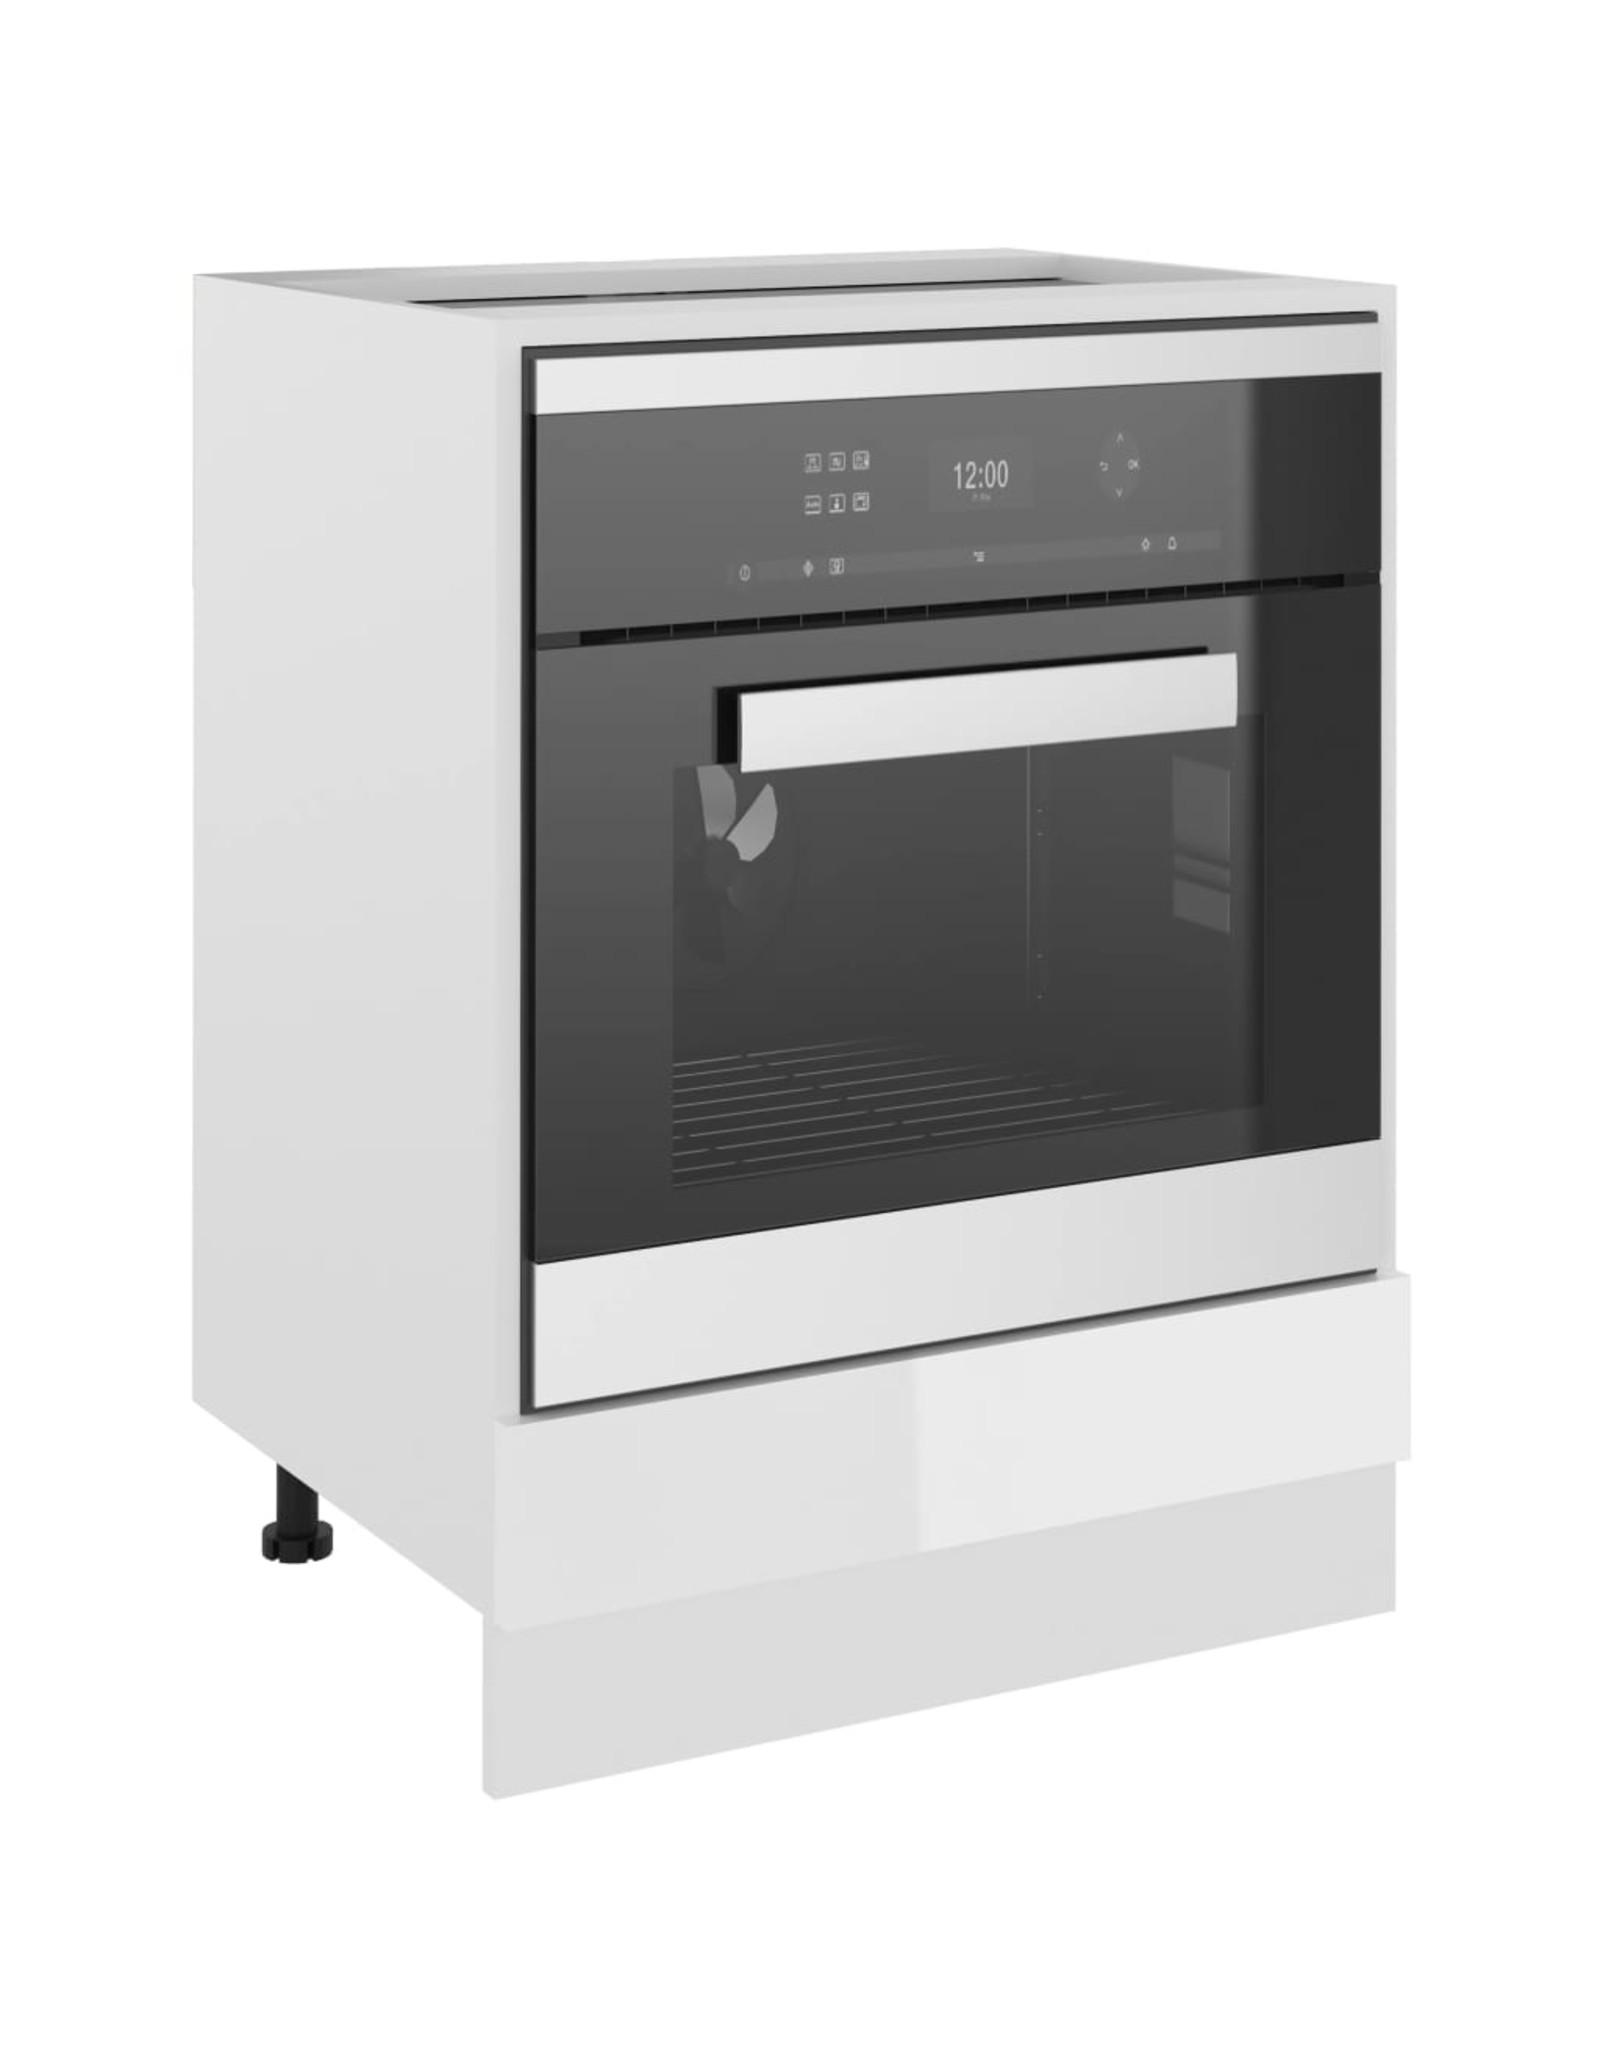 Ovenkast 60x46x81,5 cm spaanplaat hoogglans wit